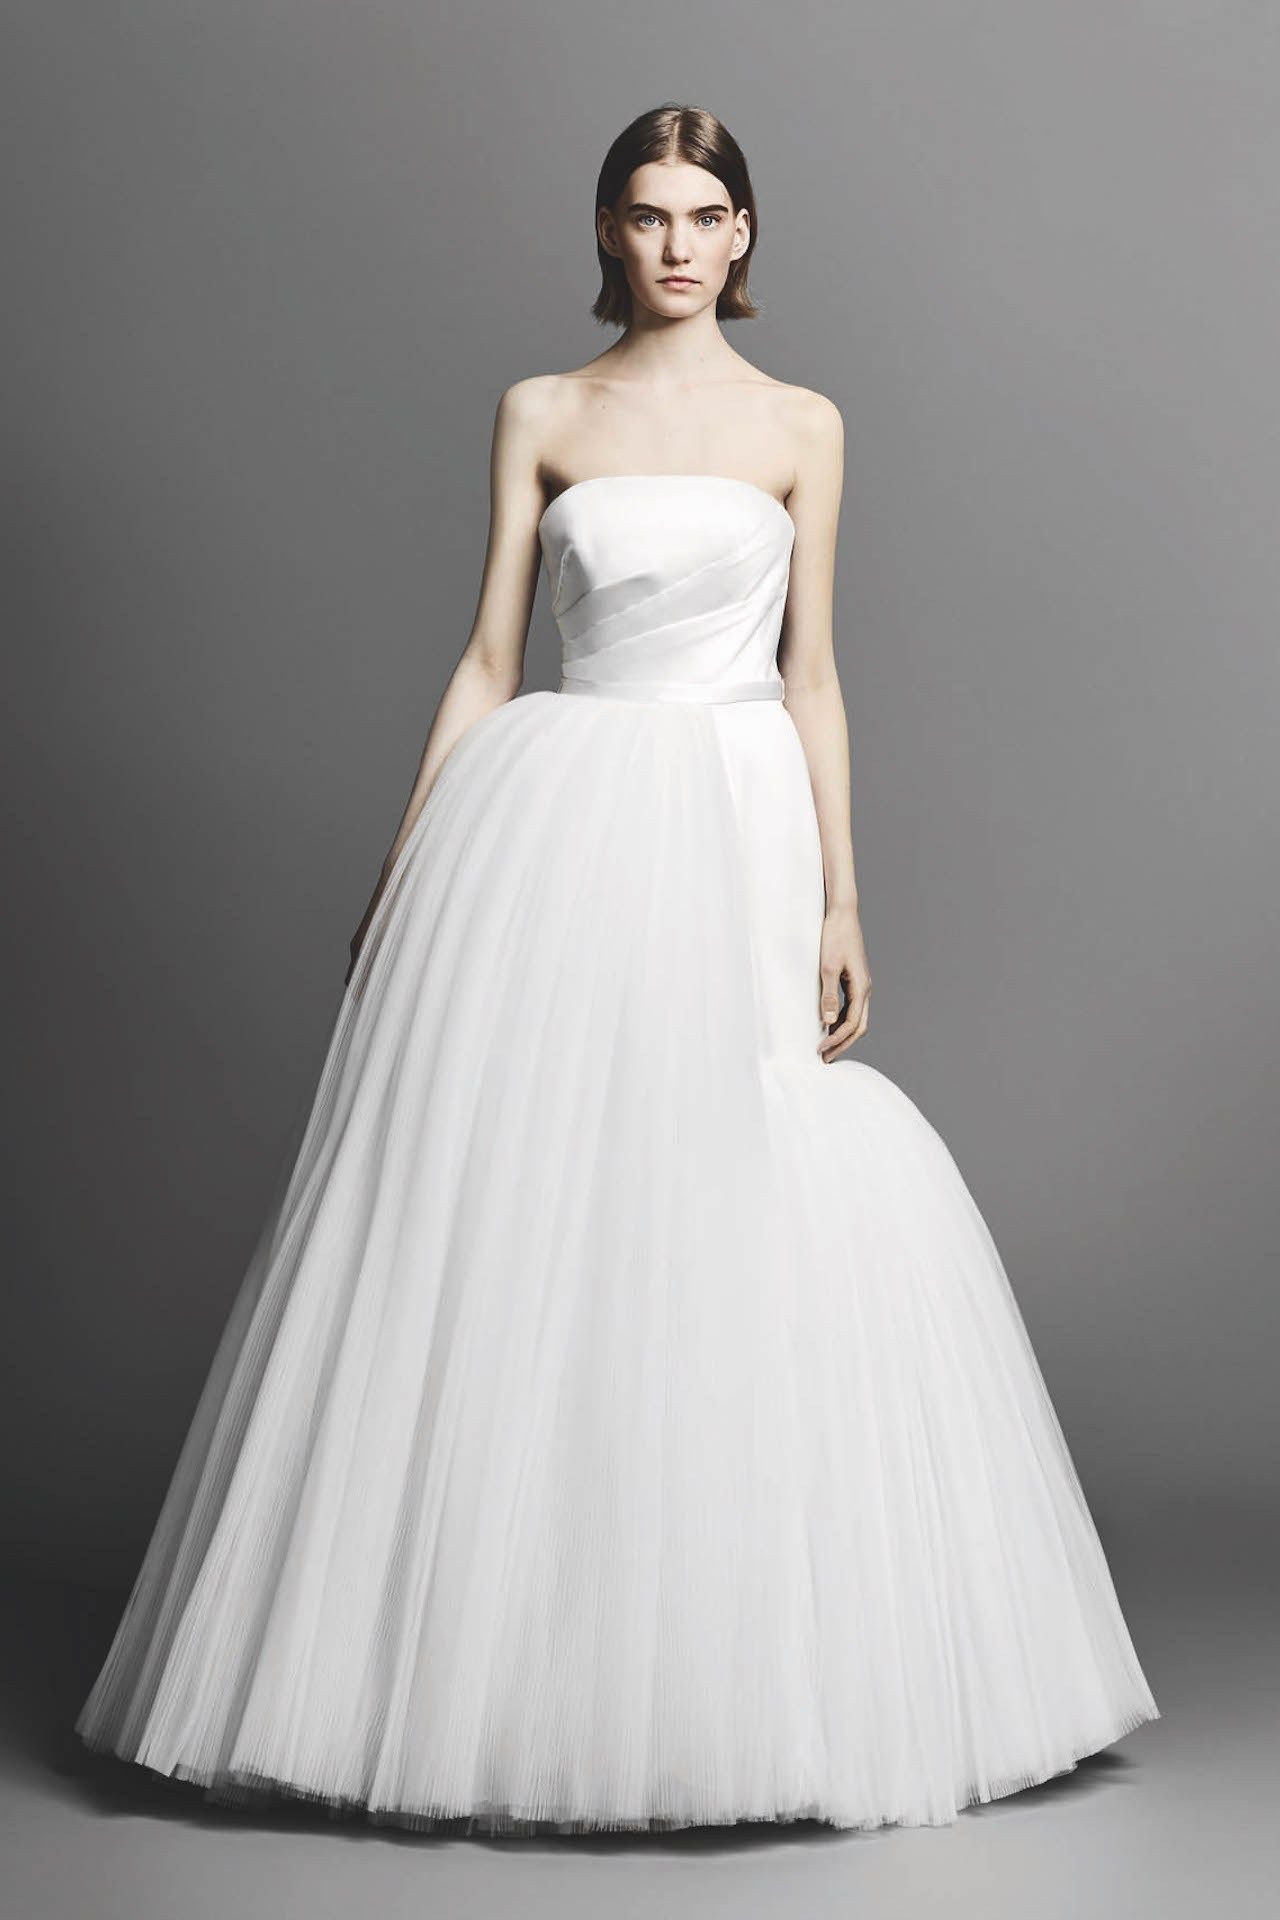 38 Beautiful Strapless Wedding Dresses